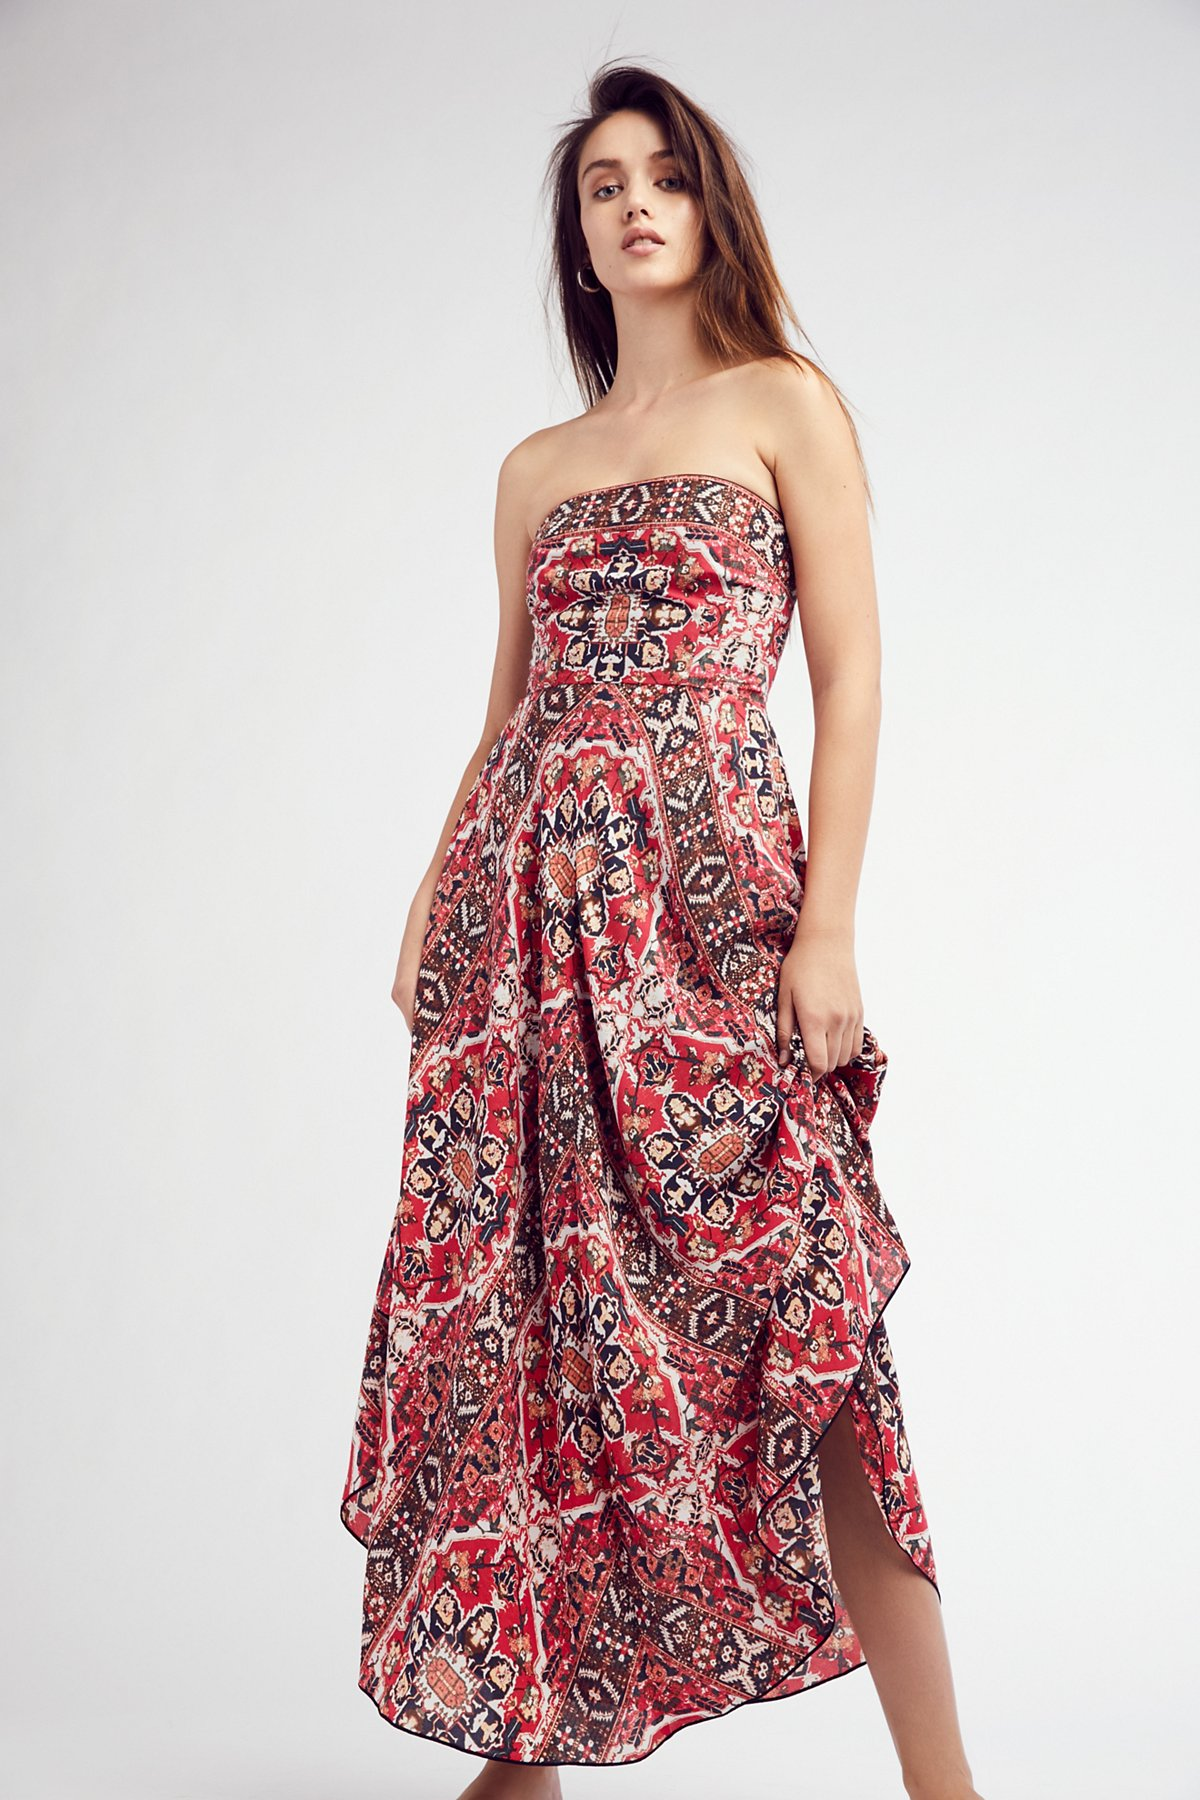 Erin's Printed Maxi Dress